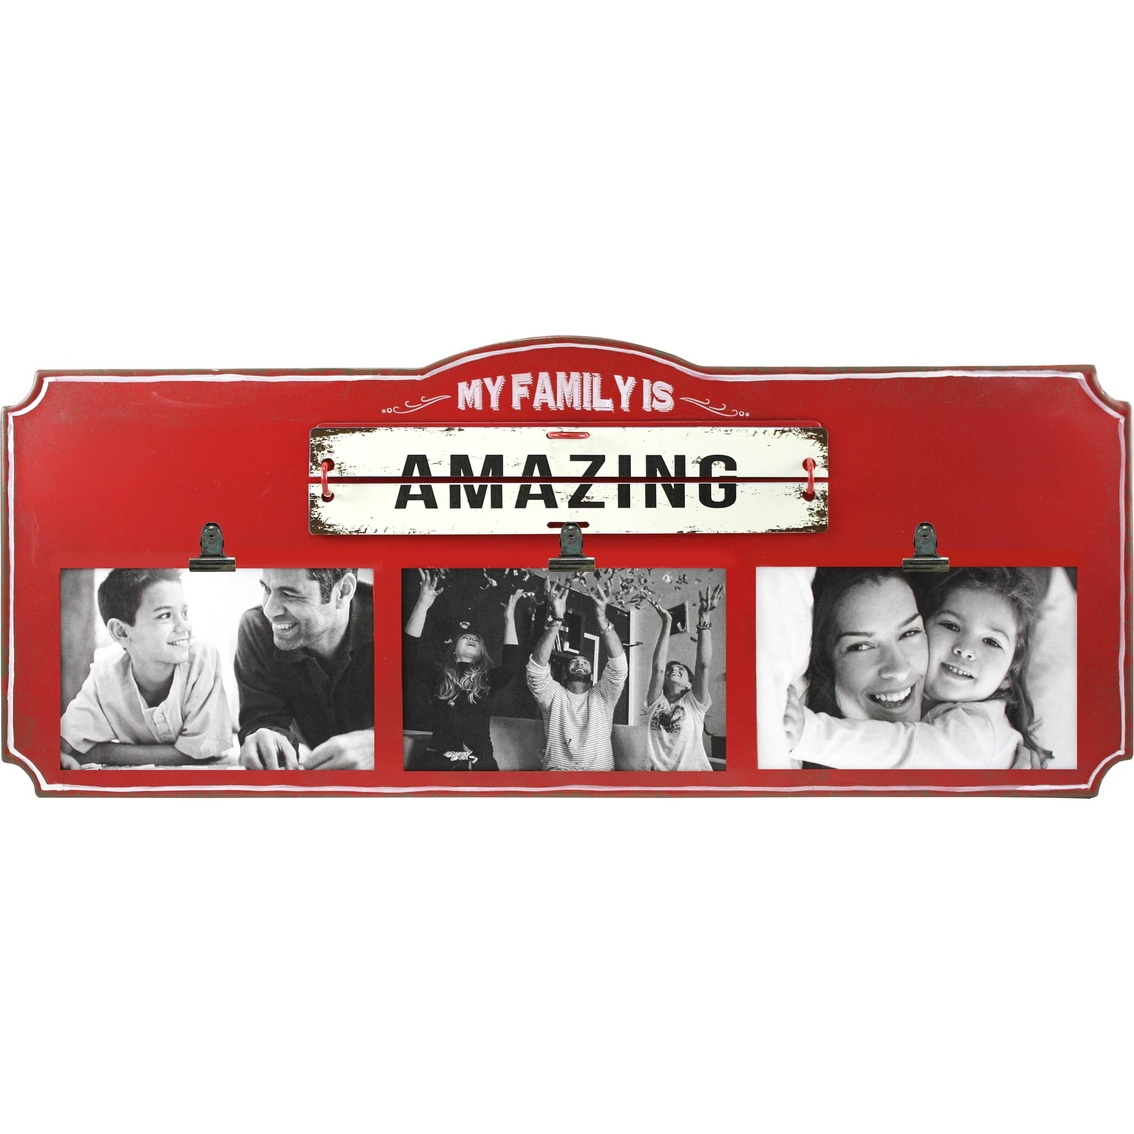 Fetco Home Decor Jargon My Family Is Amazing 20 X 8 Photo Frame